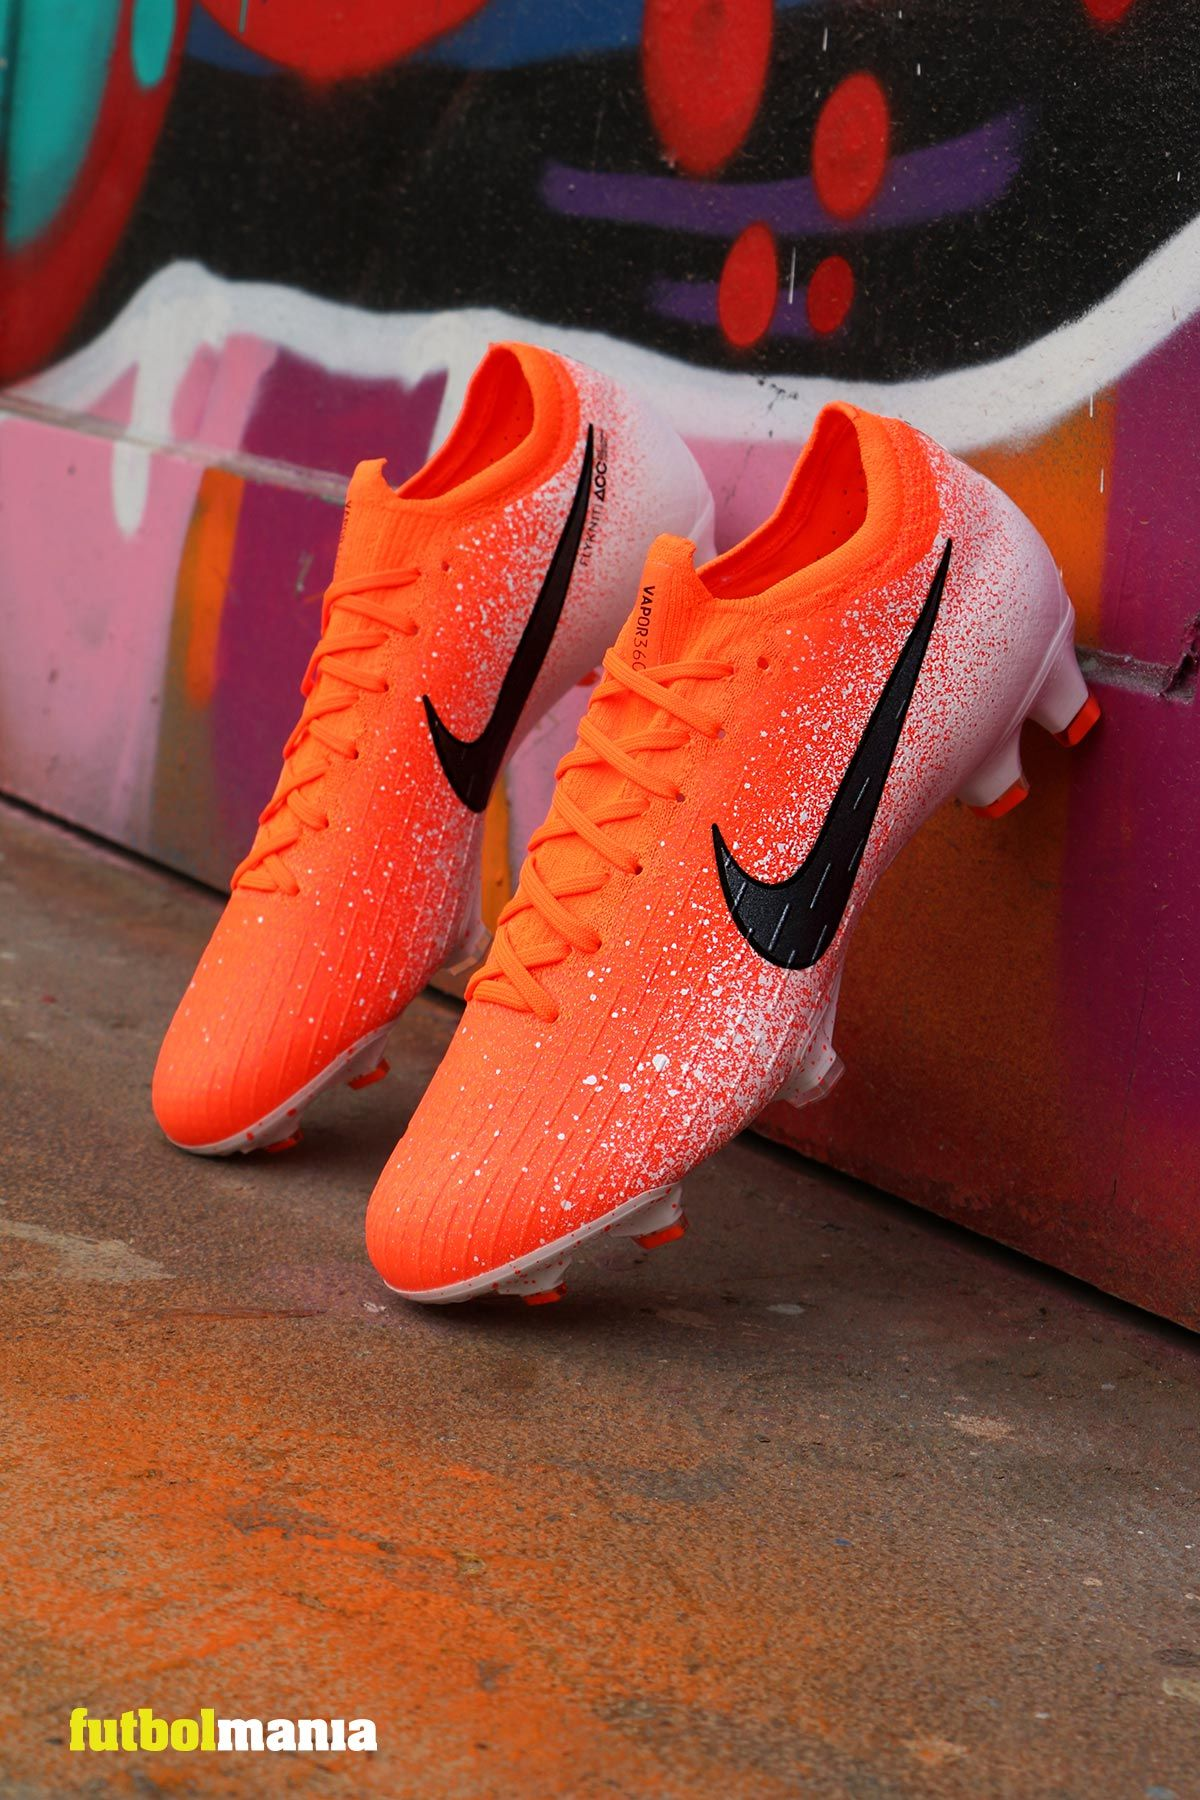 newest 6f0f7 52615 Botas de fútbol Nike Mercurial Vapor XII Elite FG. Pertenecen a la  colección Euphoria Mode